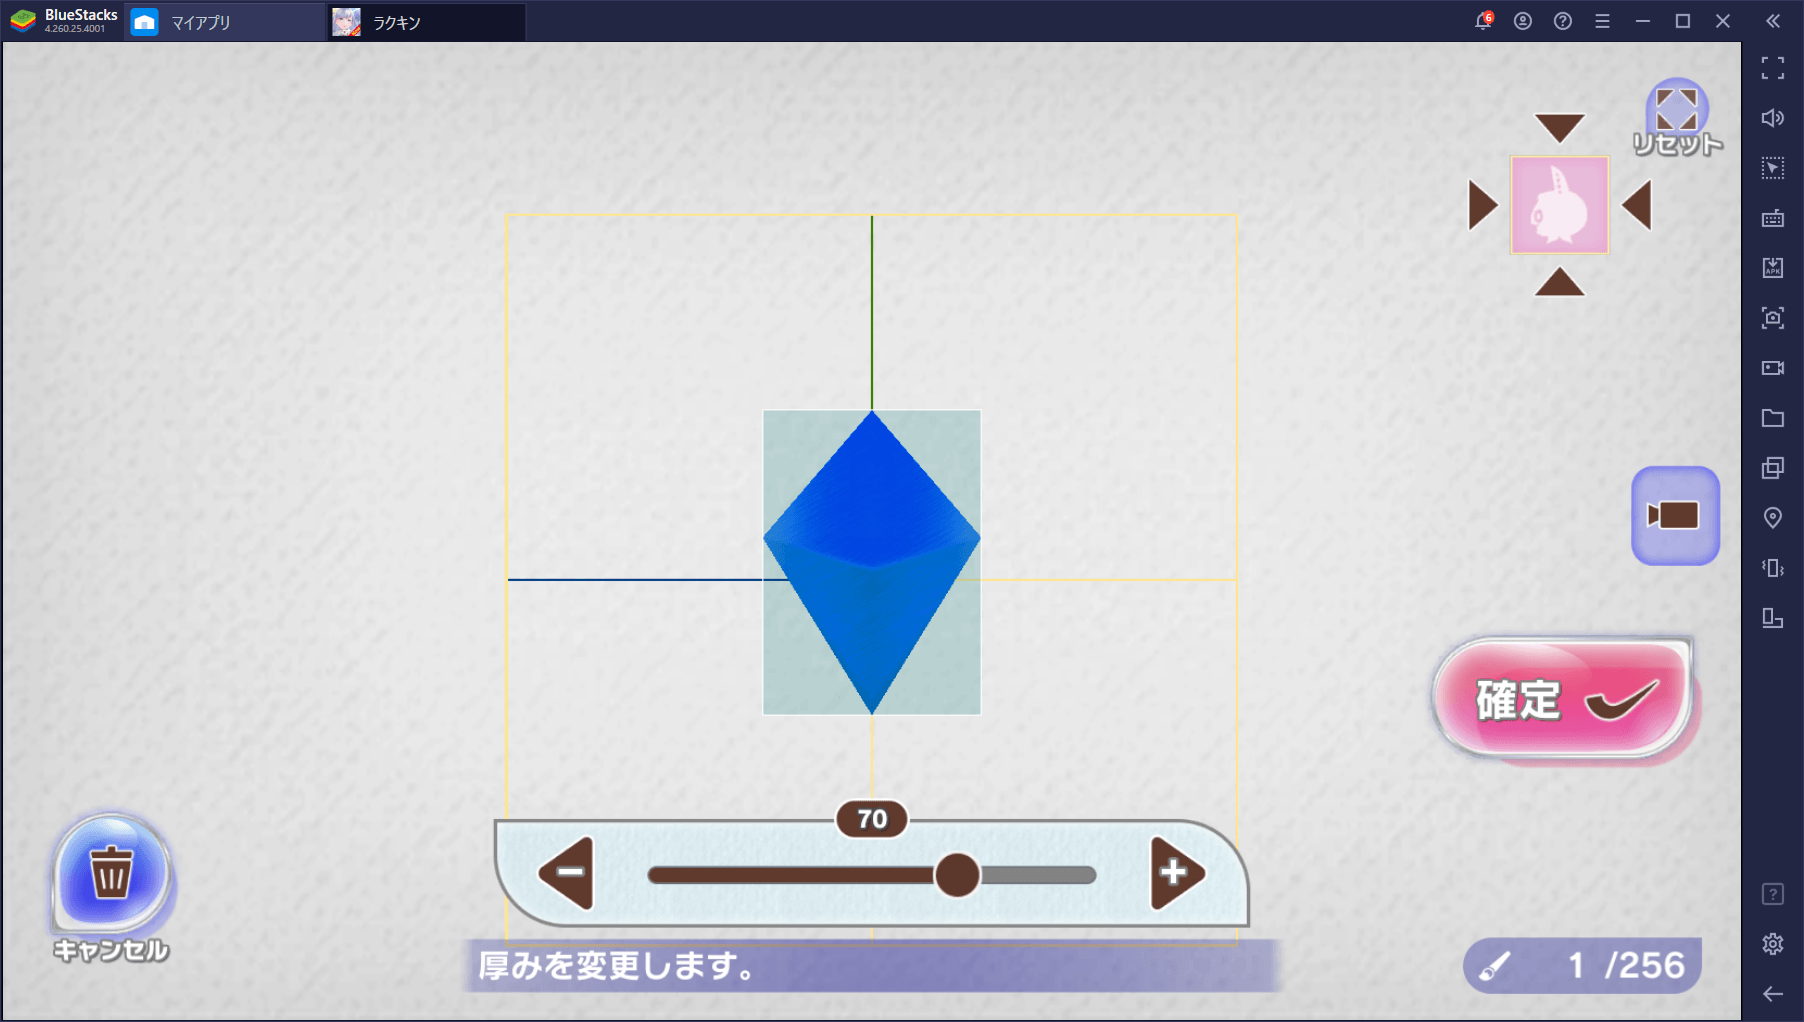 BlueStacks:『ラクガキ キングダム』ラクガキを描く際のコツとツールの使い方!